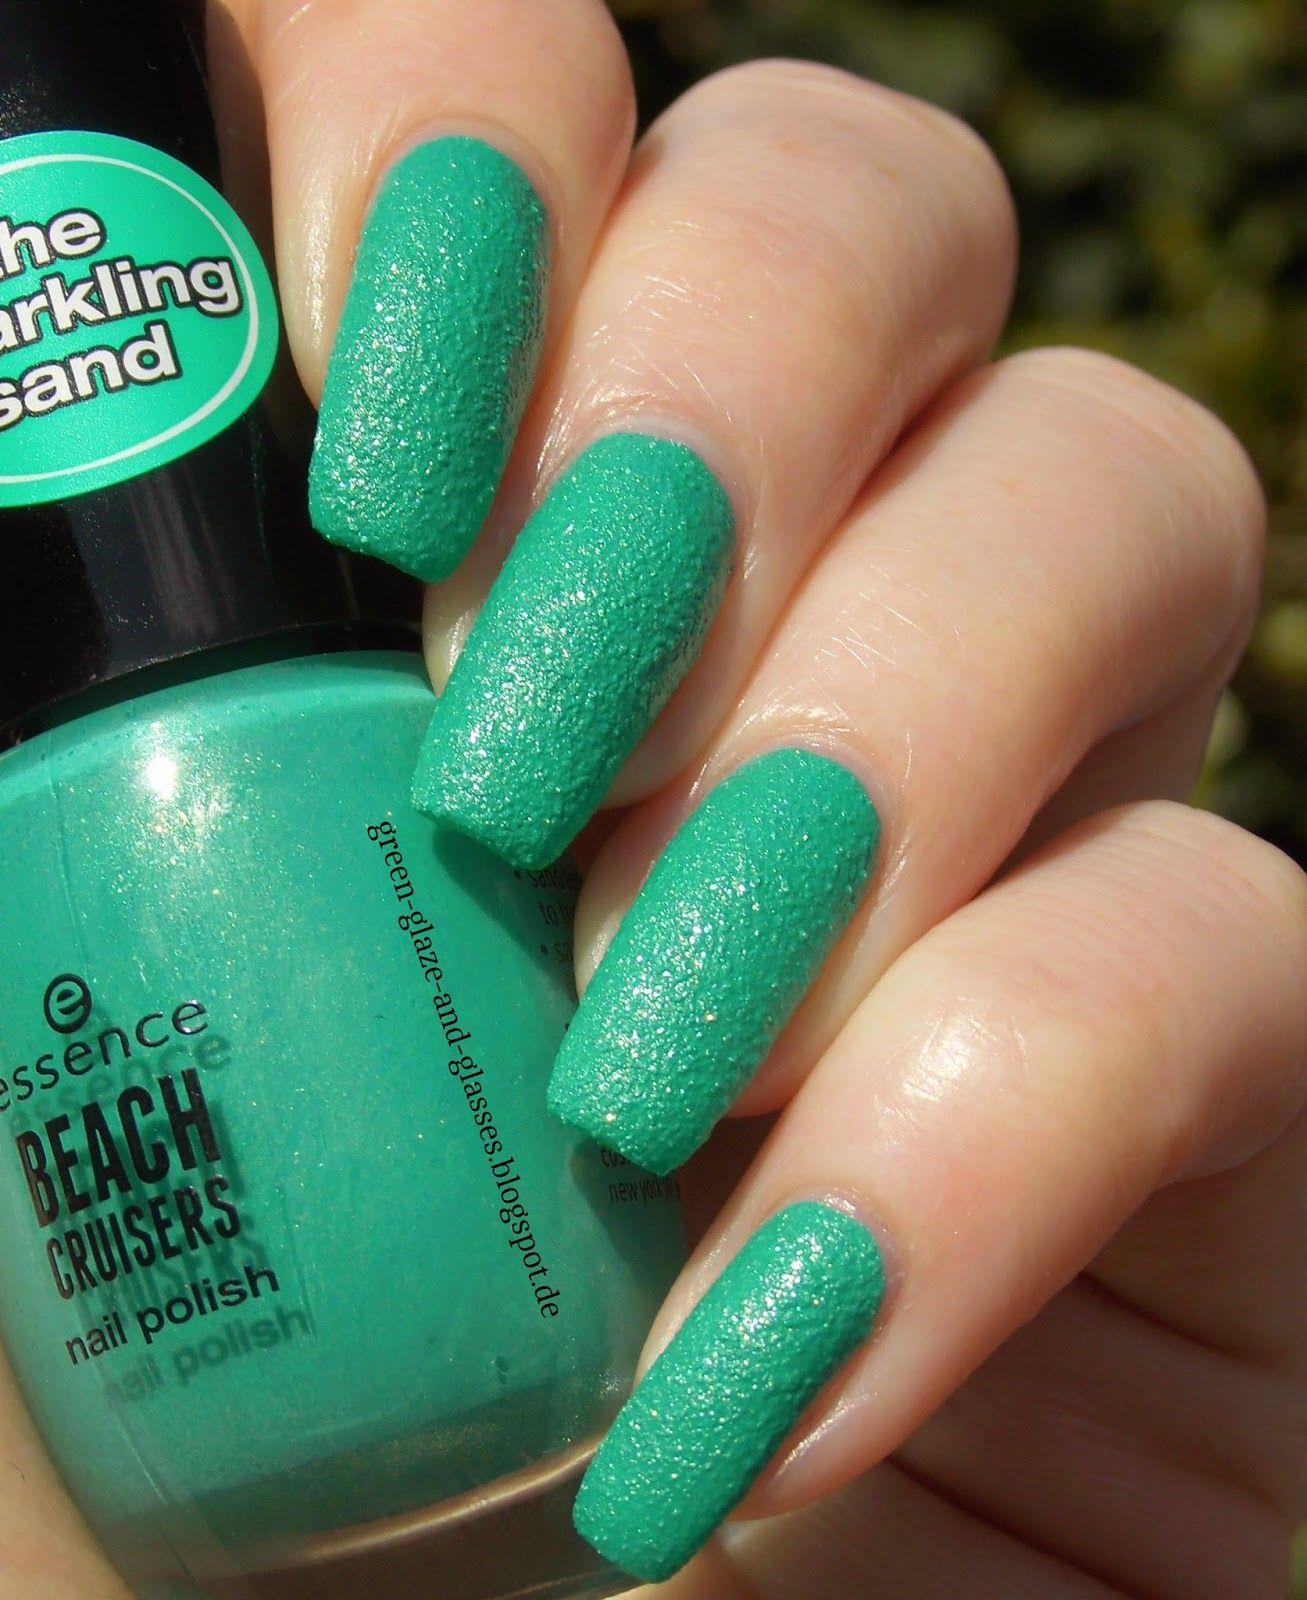 Green, Glaze & Glasses: Essence Sparkling Sand - 03 keep calm and go to the beach! (Beach Cruisers LE)